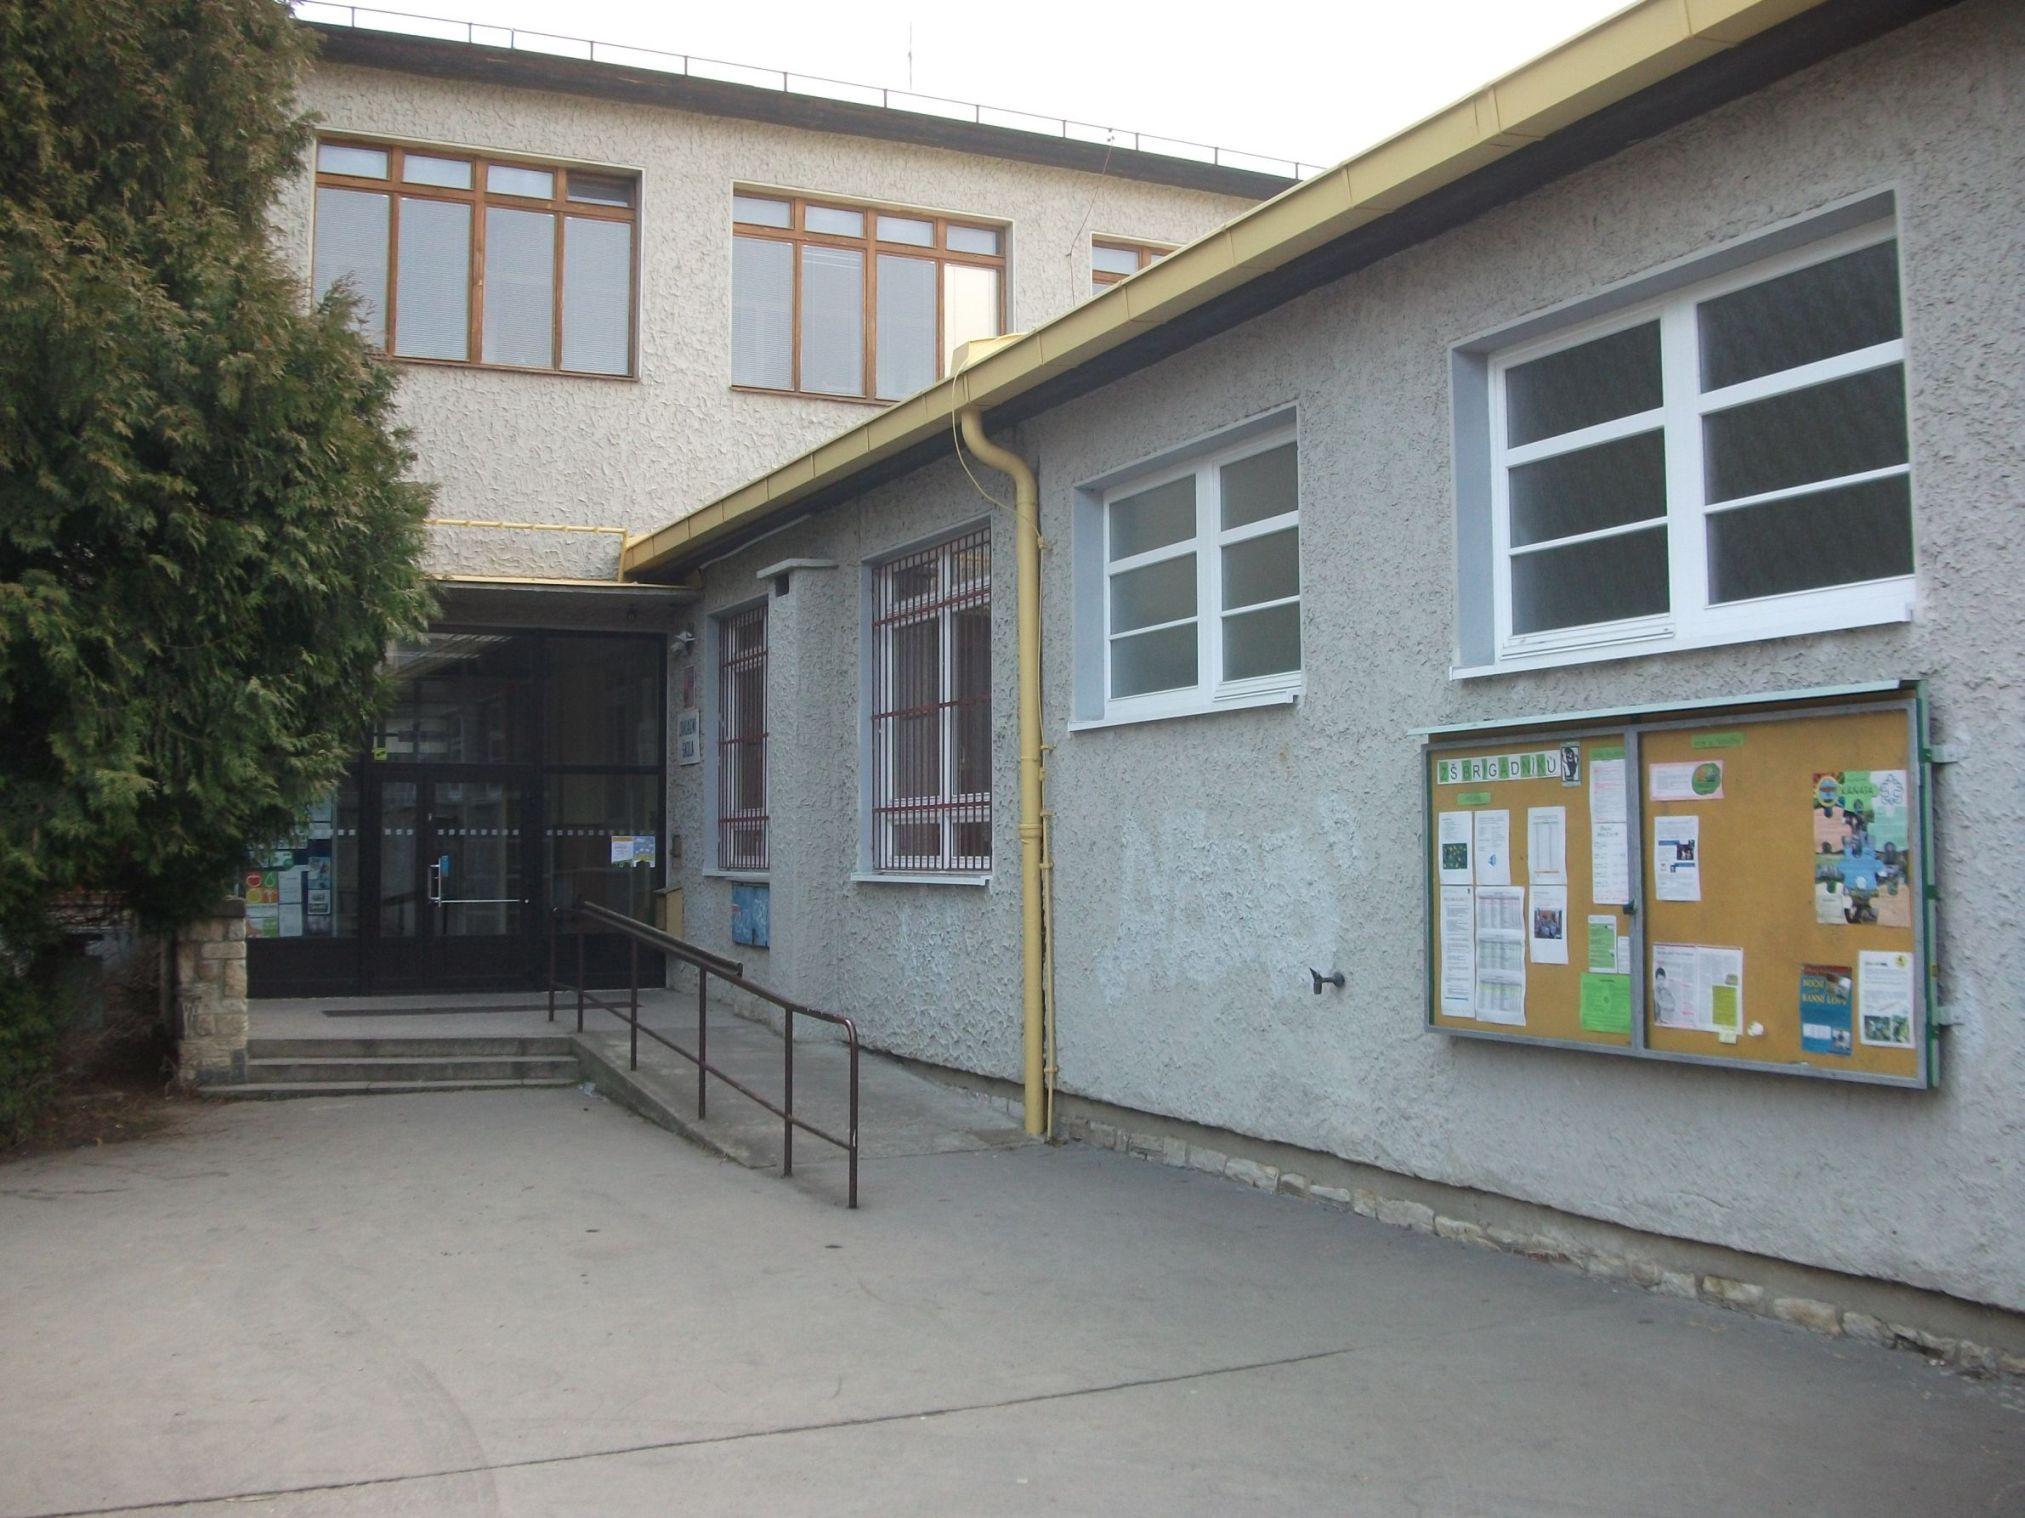 Brigadniku-Praha-Primary-school-in-Slovakia1